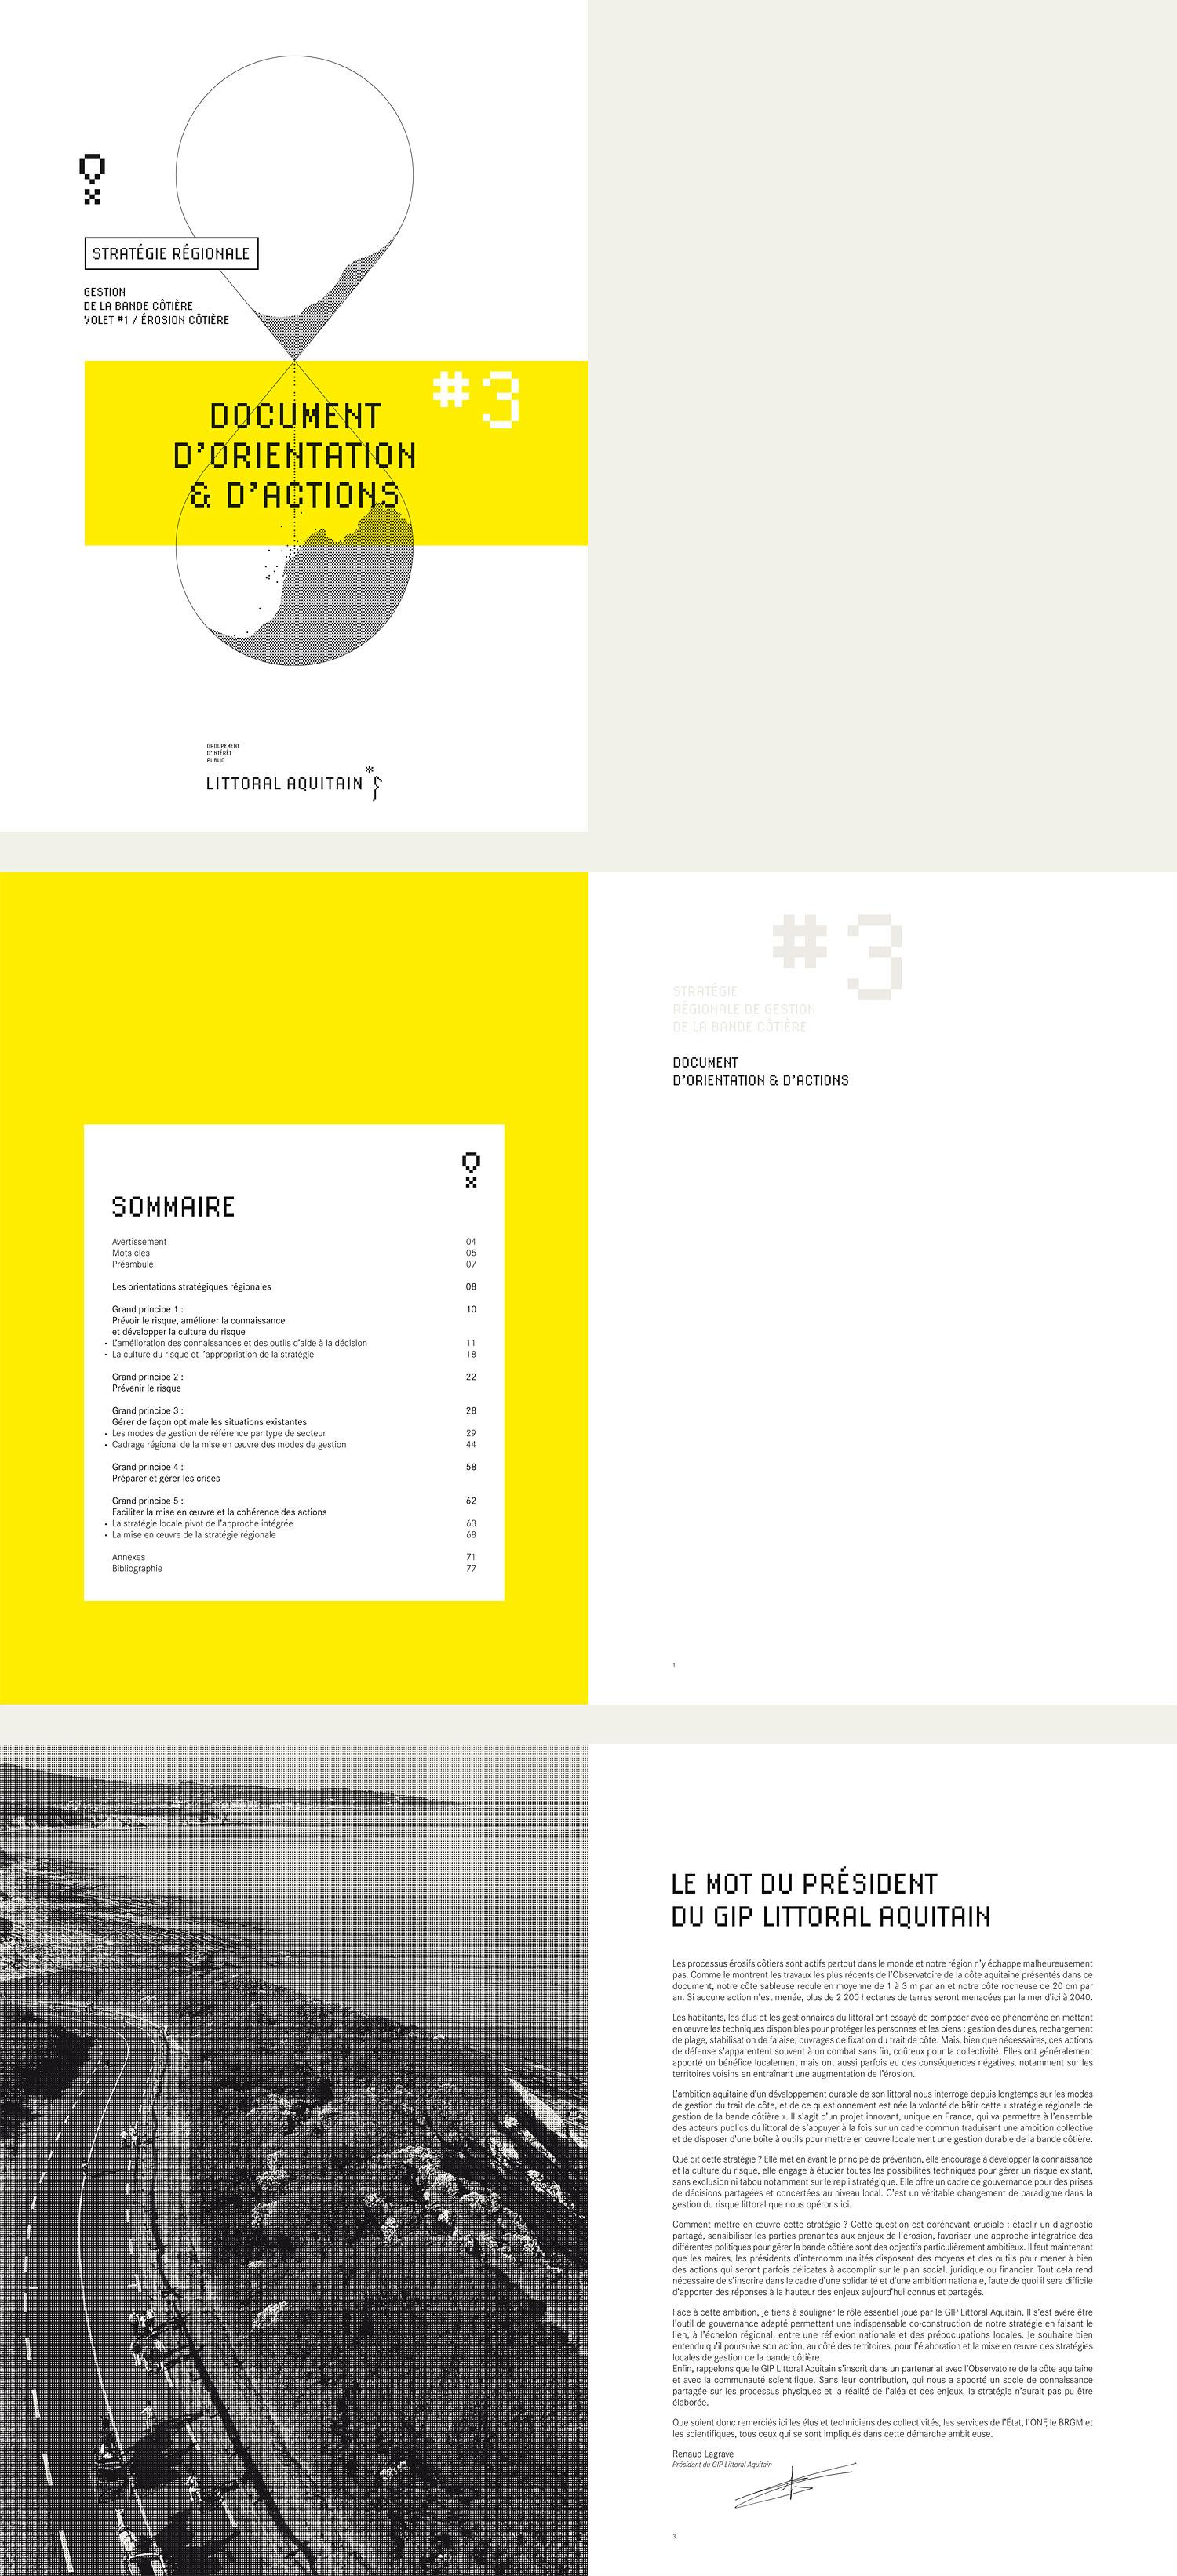 MrThornill-design-littoral-aquitain-2013-f1